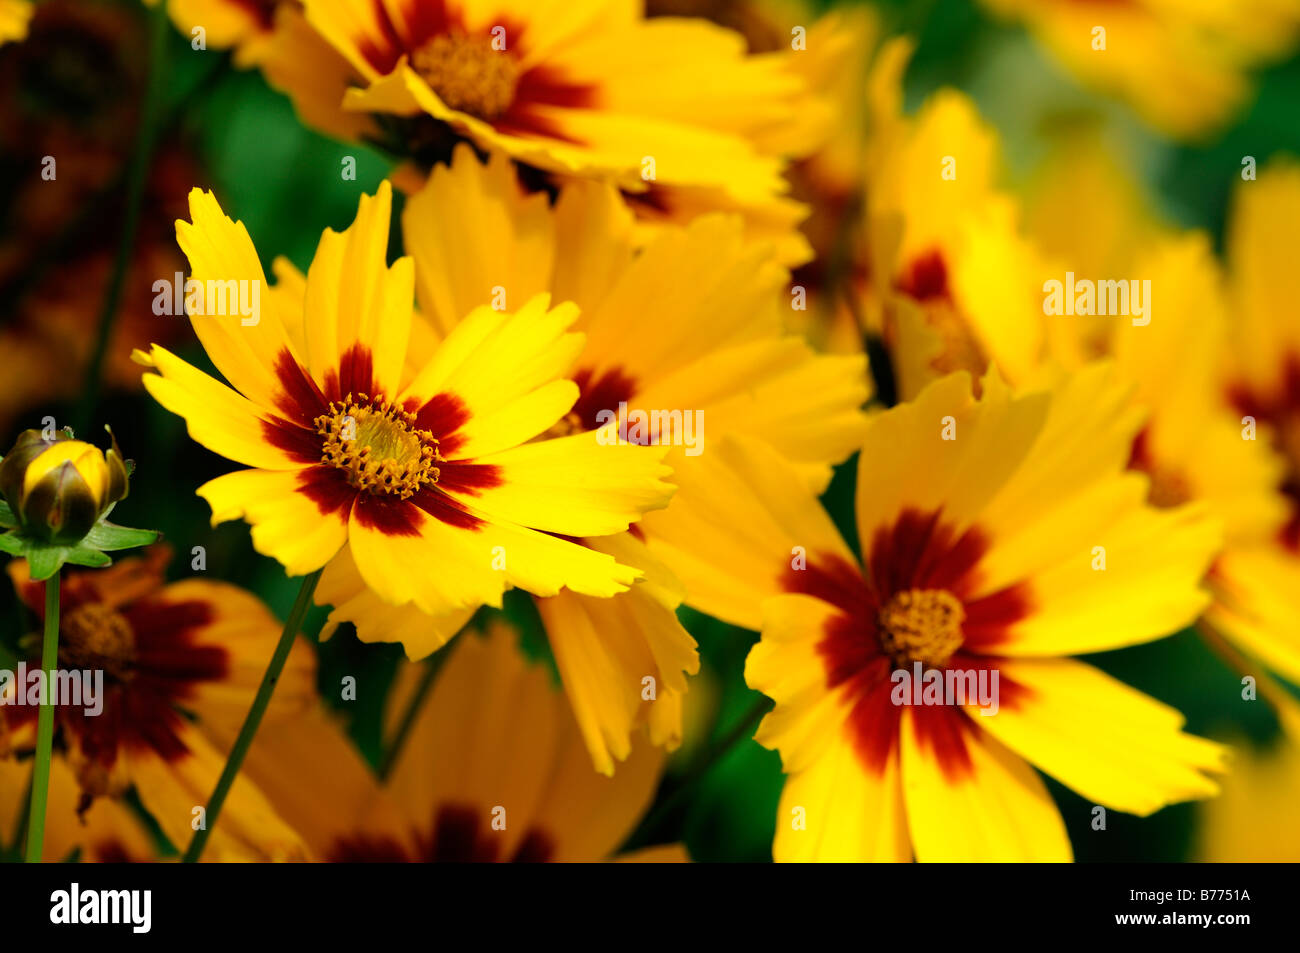 Coreopsis Grandiflora Stock Photos Coreopsis Grandiflora Stock